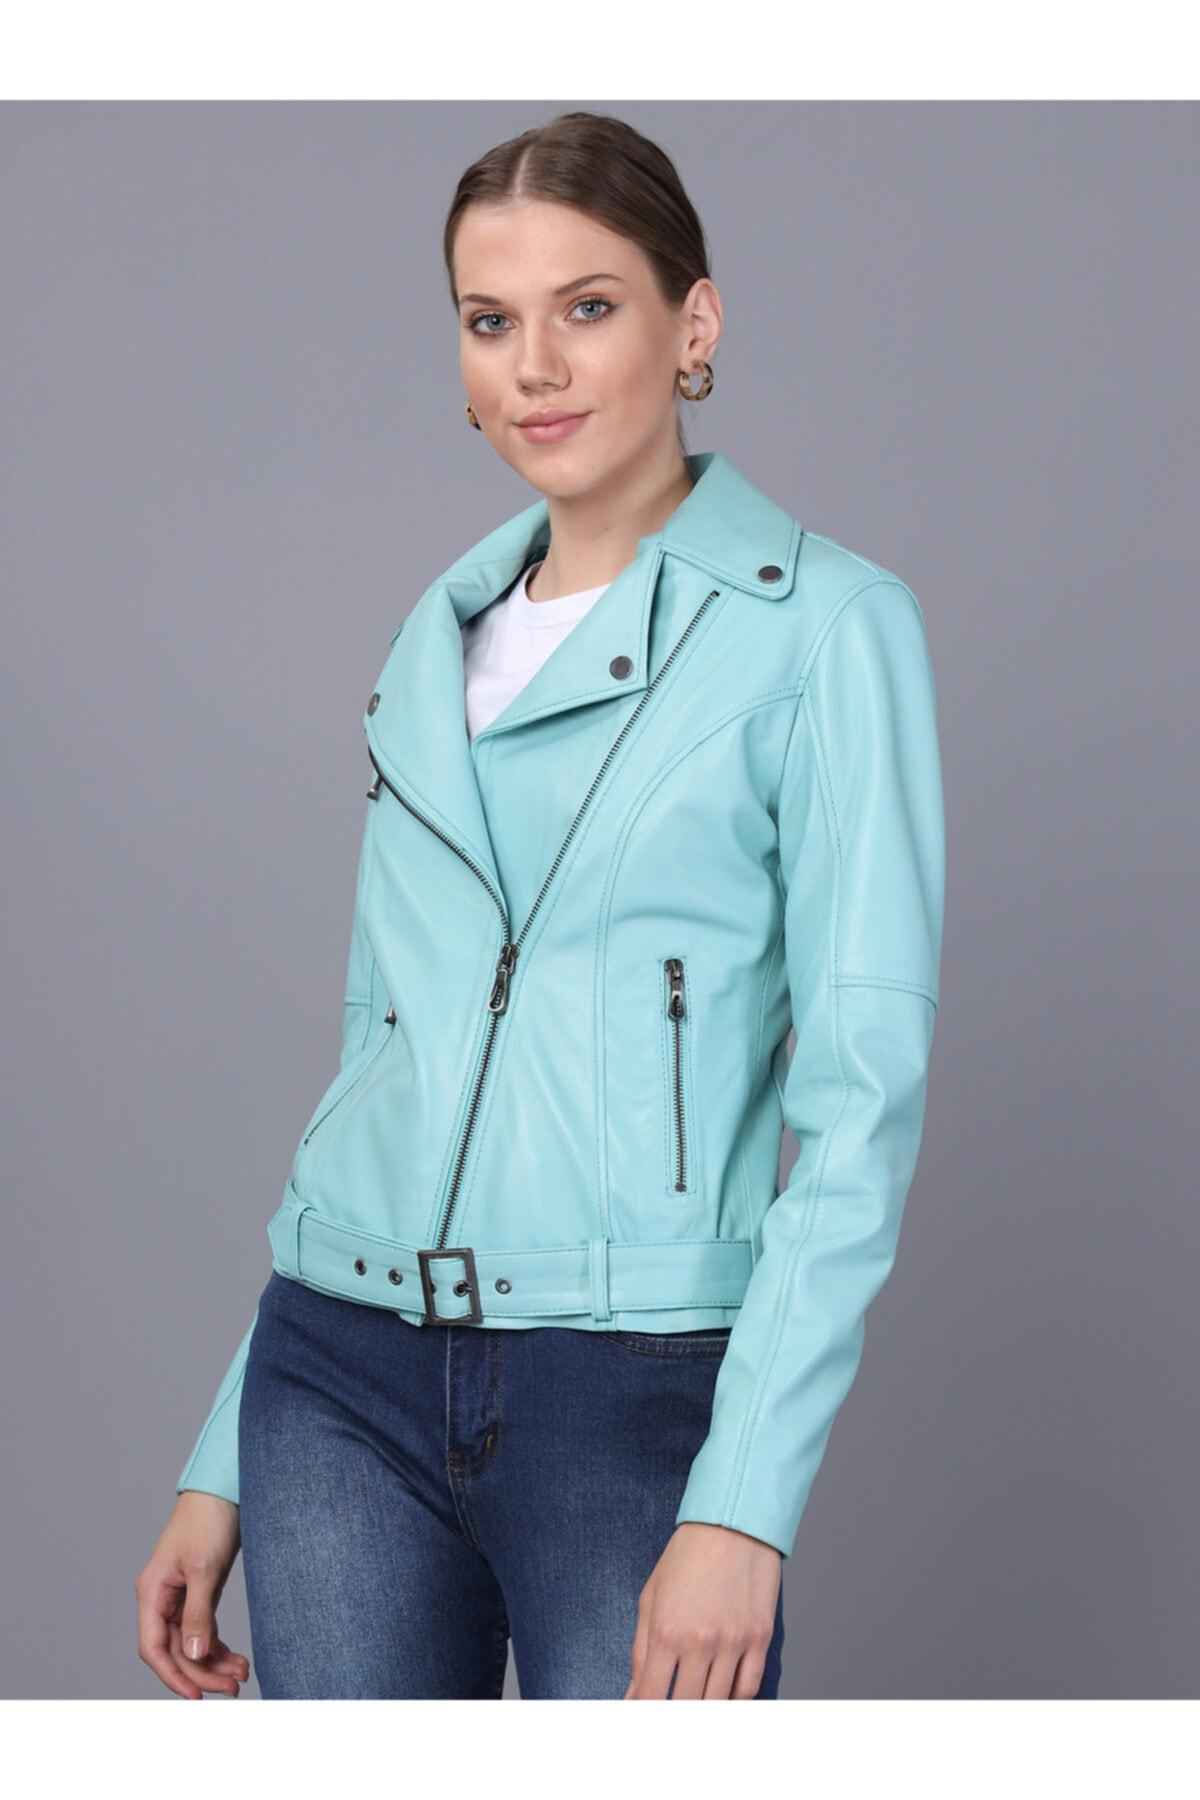 Basics&More Kadın Mint Deri Ceket 1